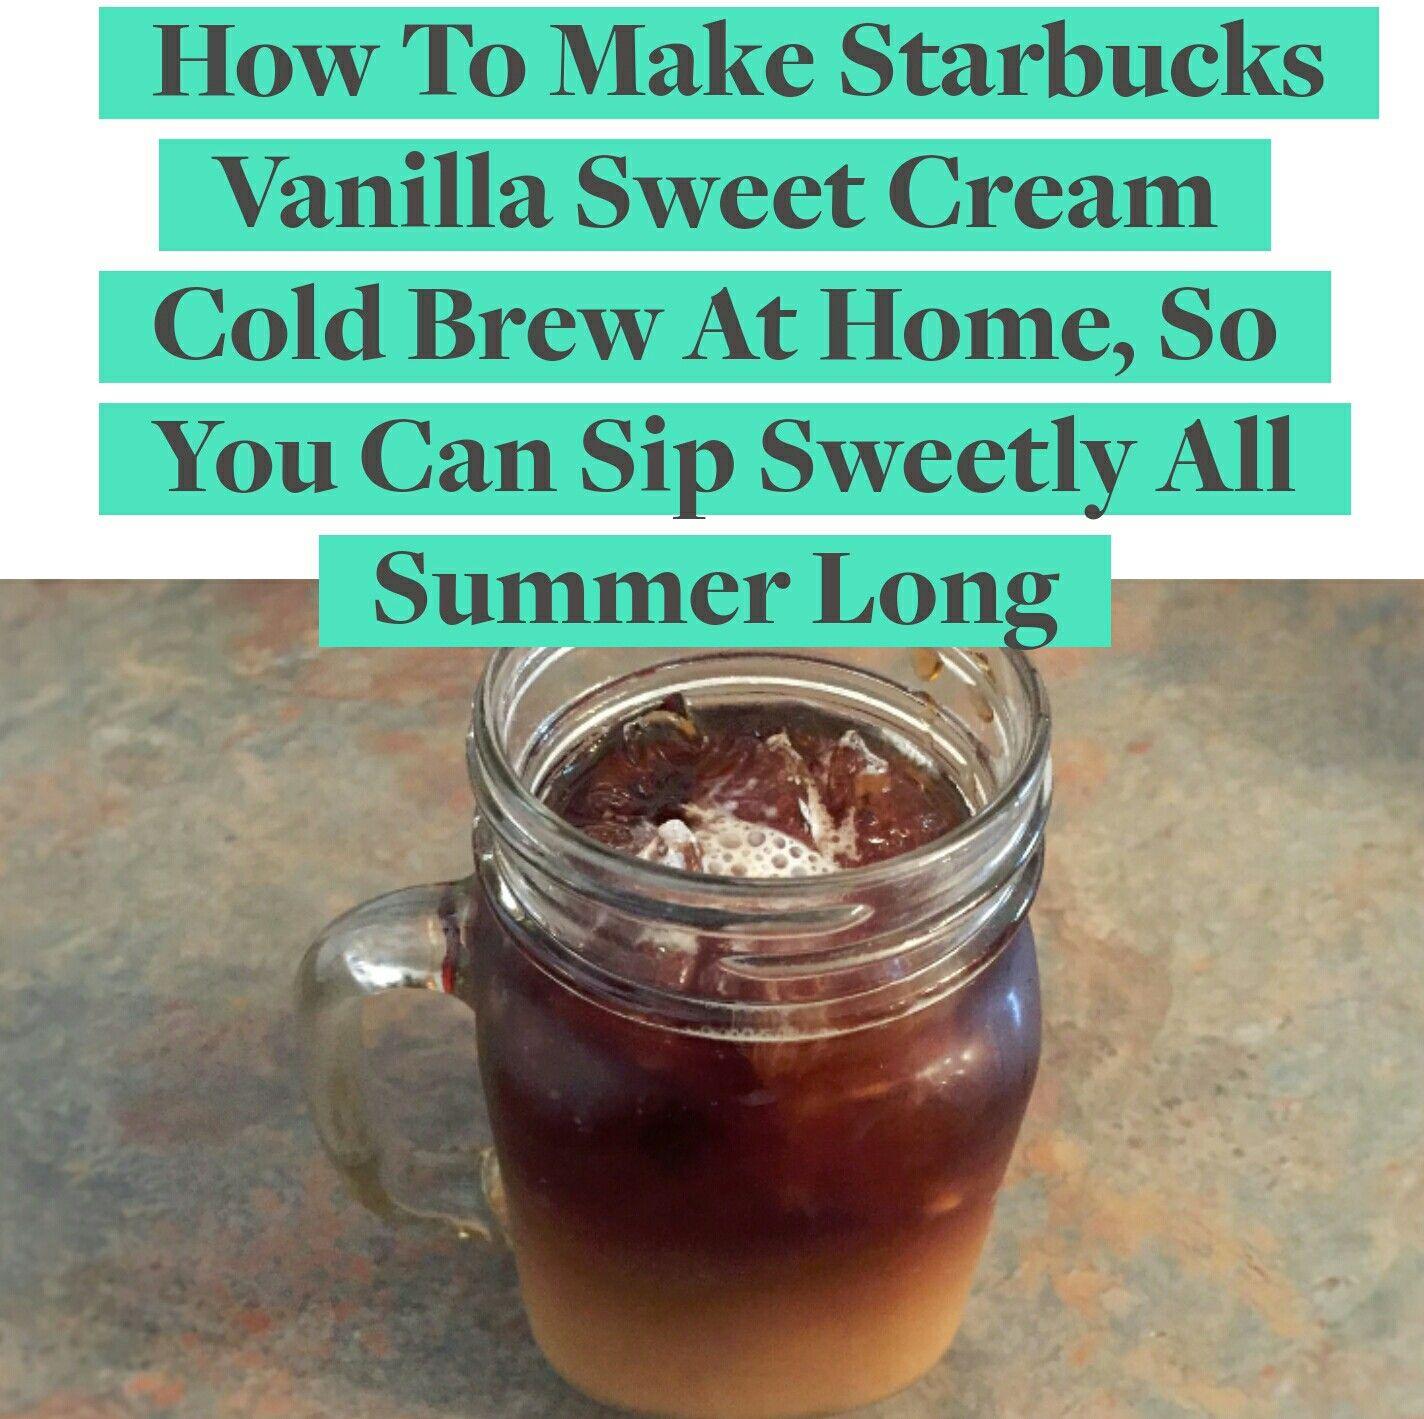 How to make starbucks vanilla sweet cream cold brew at